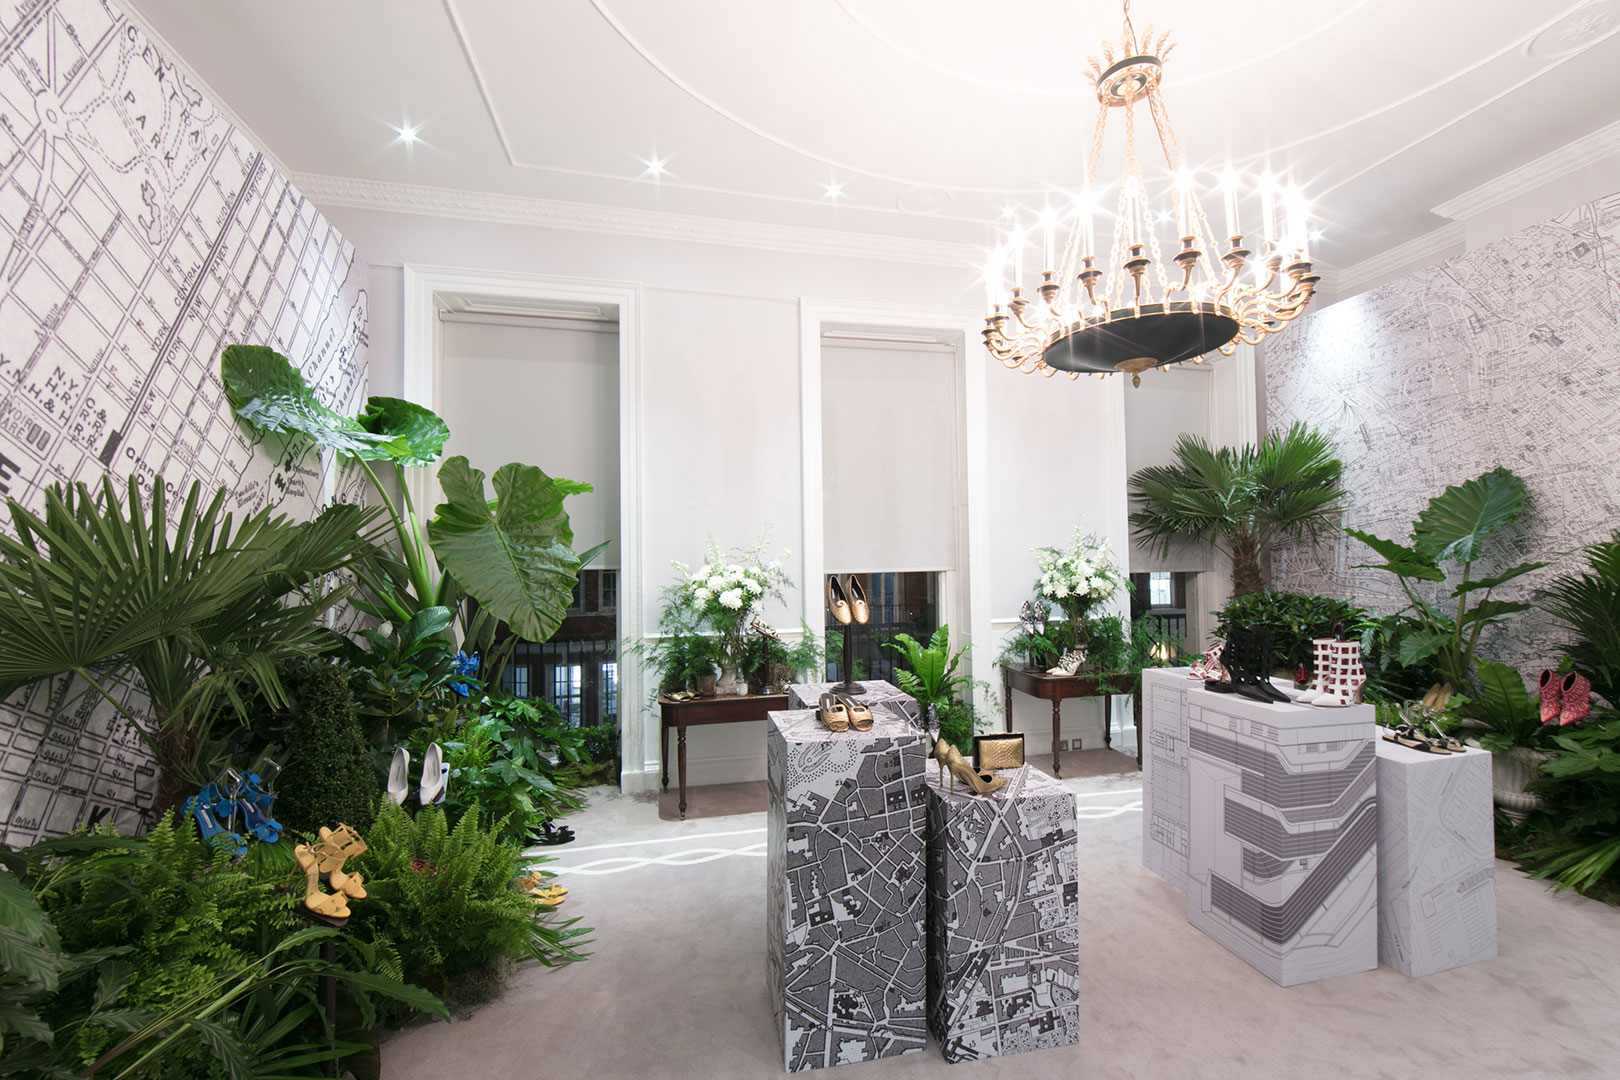 Manolo Blahnik showroom